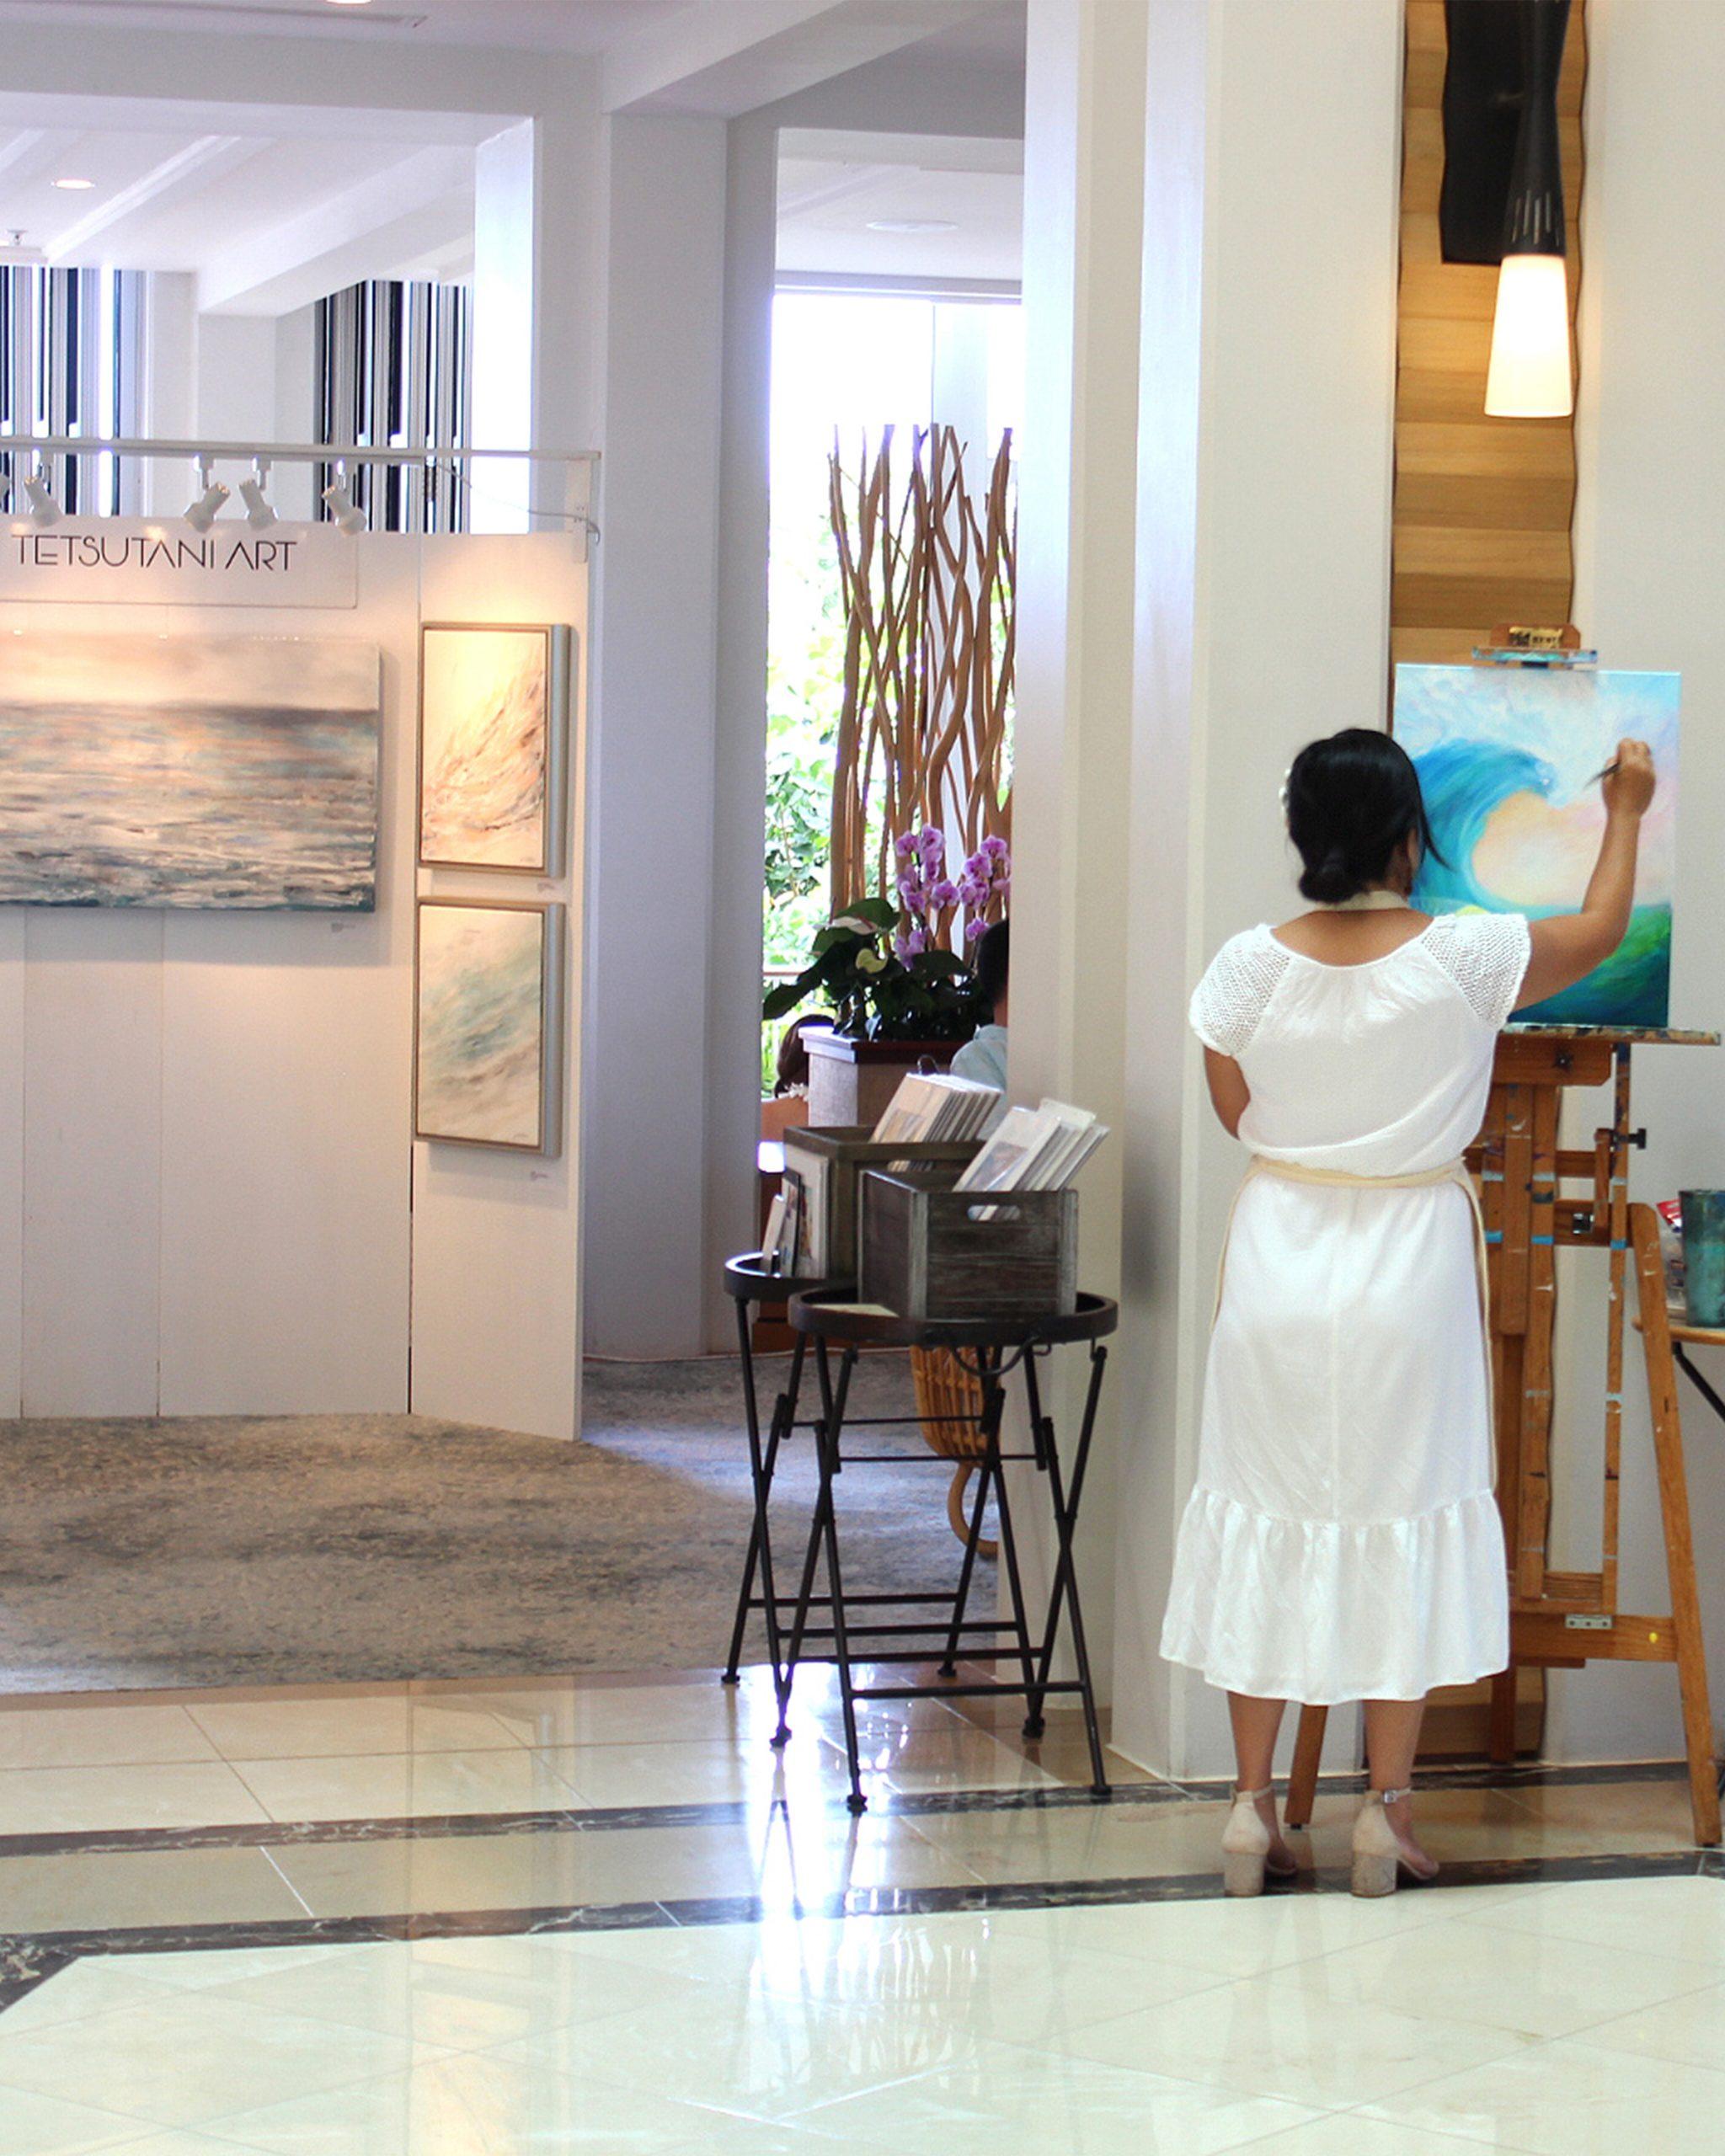 Renown Hawaii artist Jan Tetsutani at Four Seasons Resort O'ahu Painting Live in the Lobby